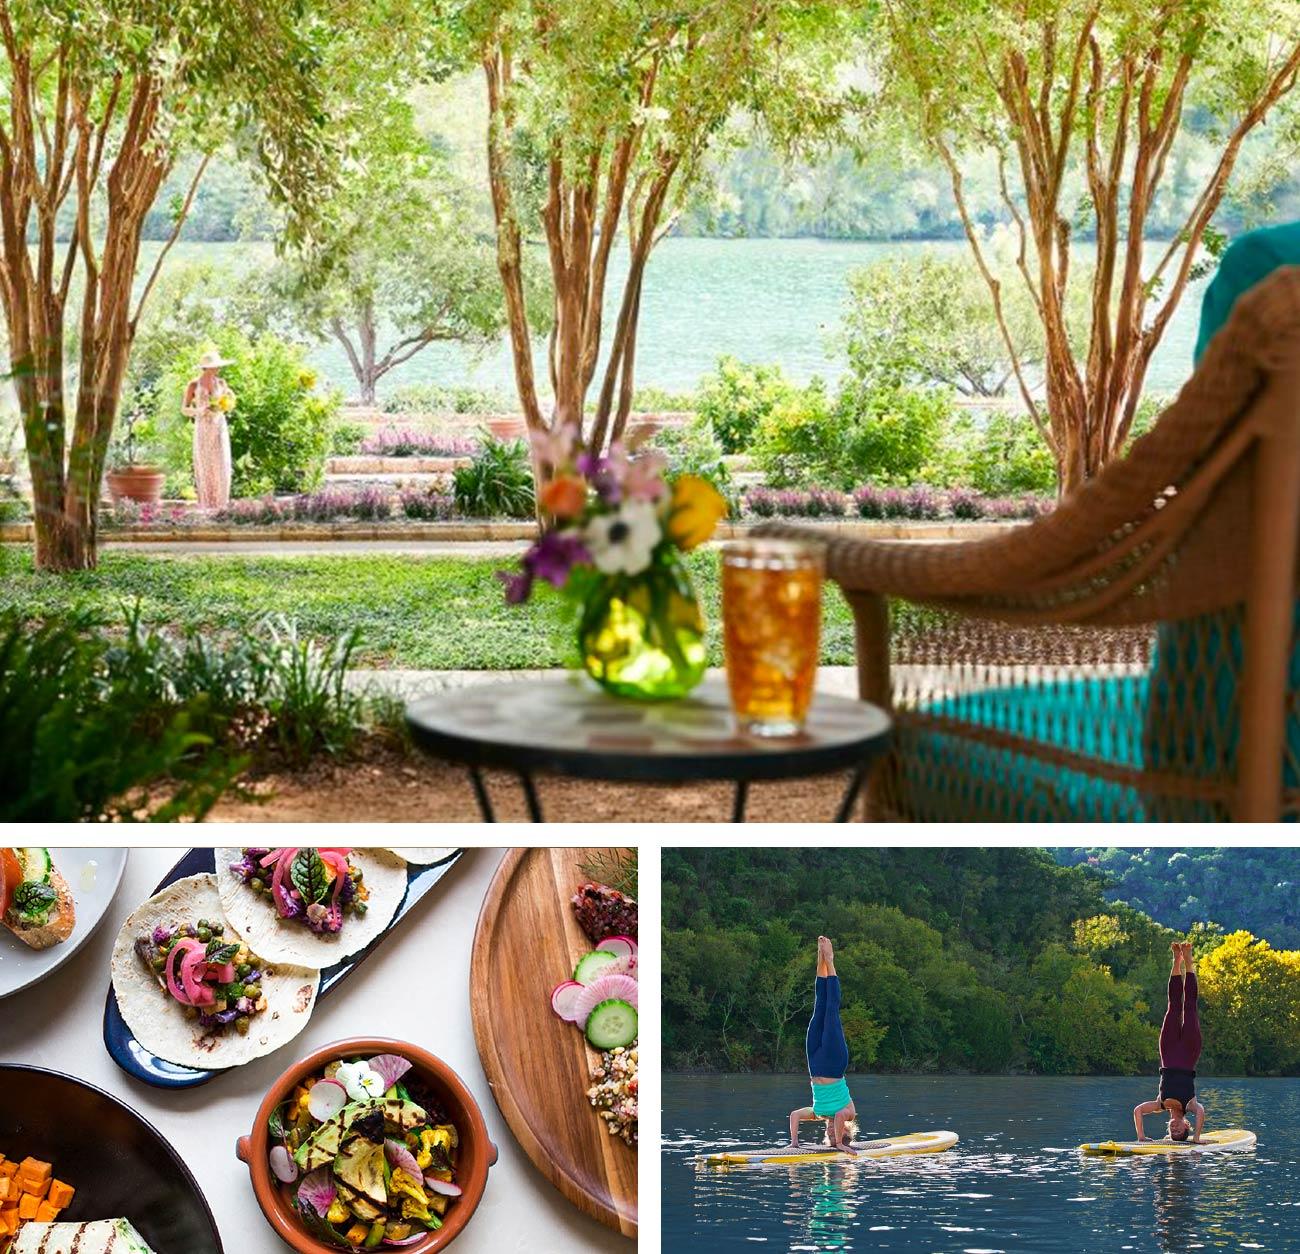 Lake Austin Spa and Resort